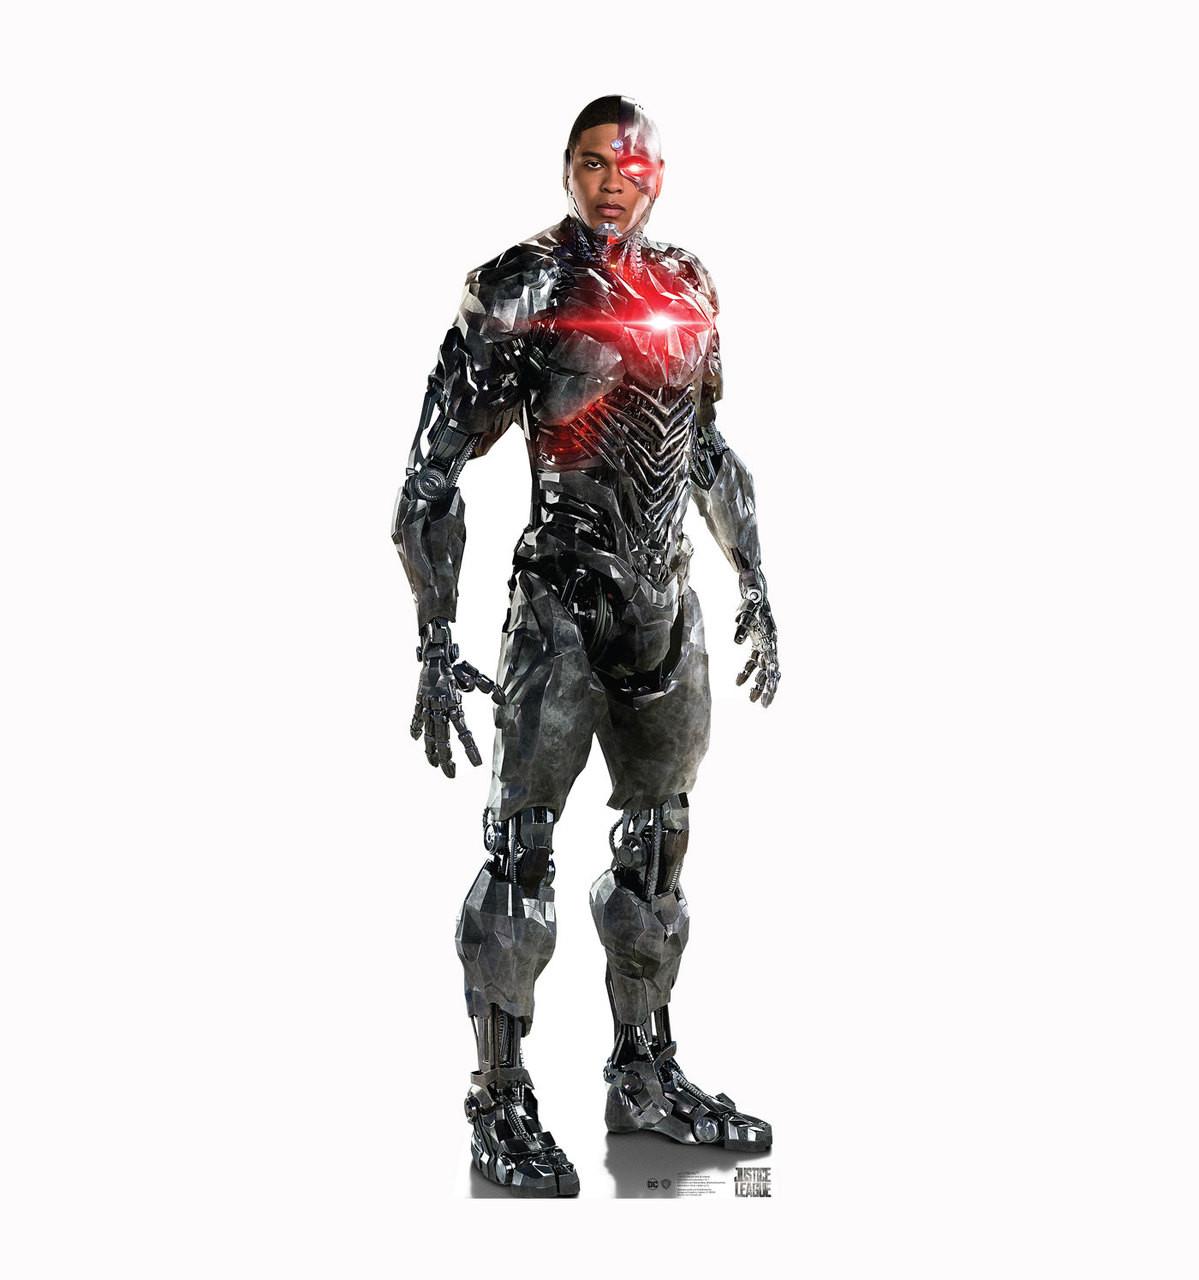 Cyborg-Justice League Cardboard Cutout